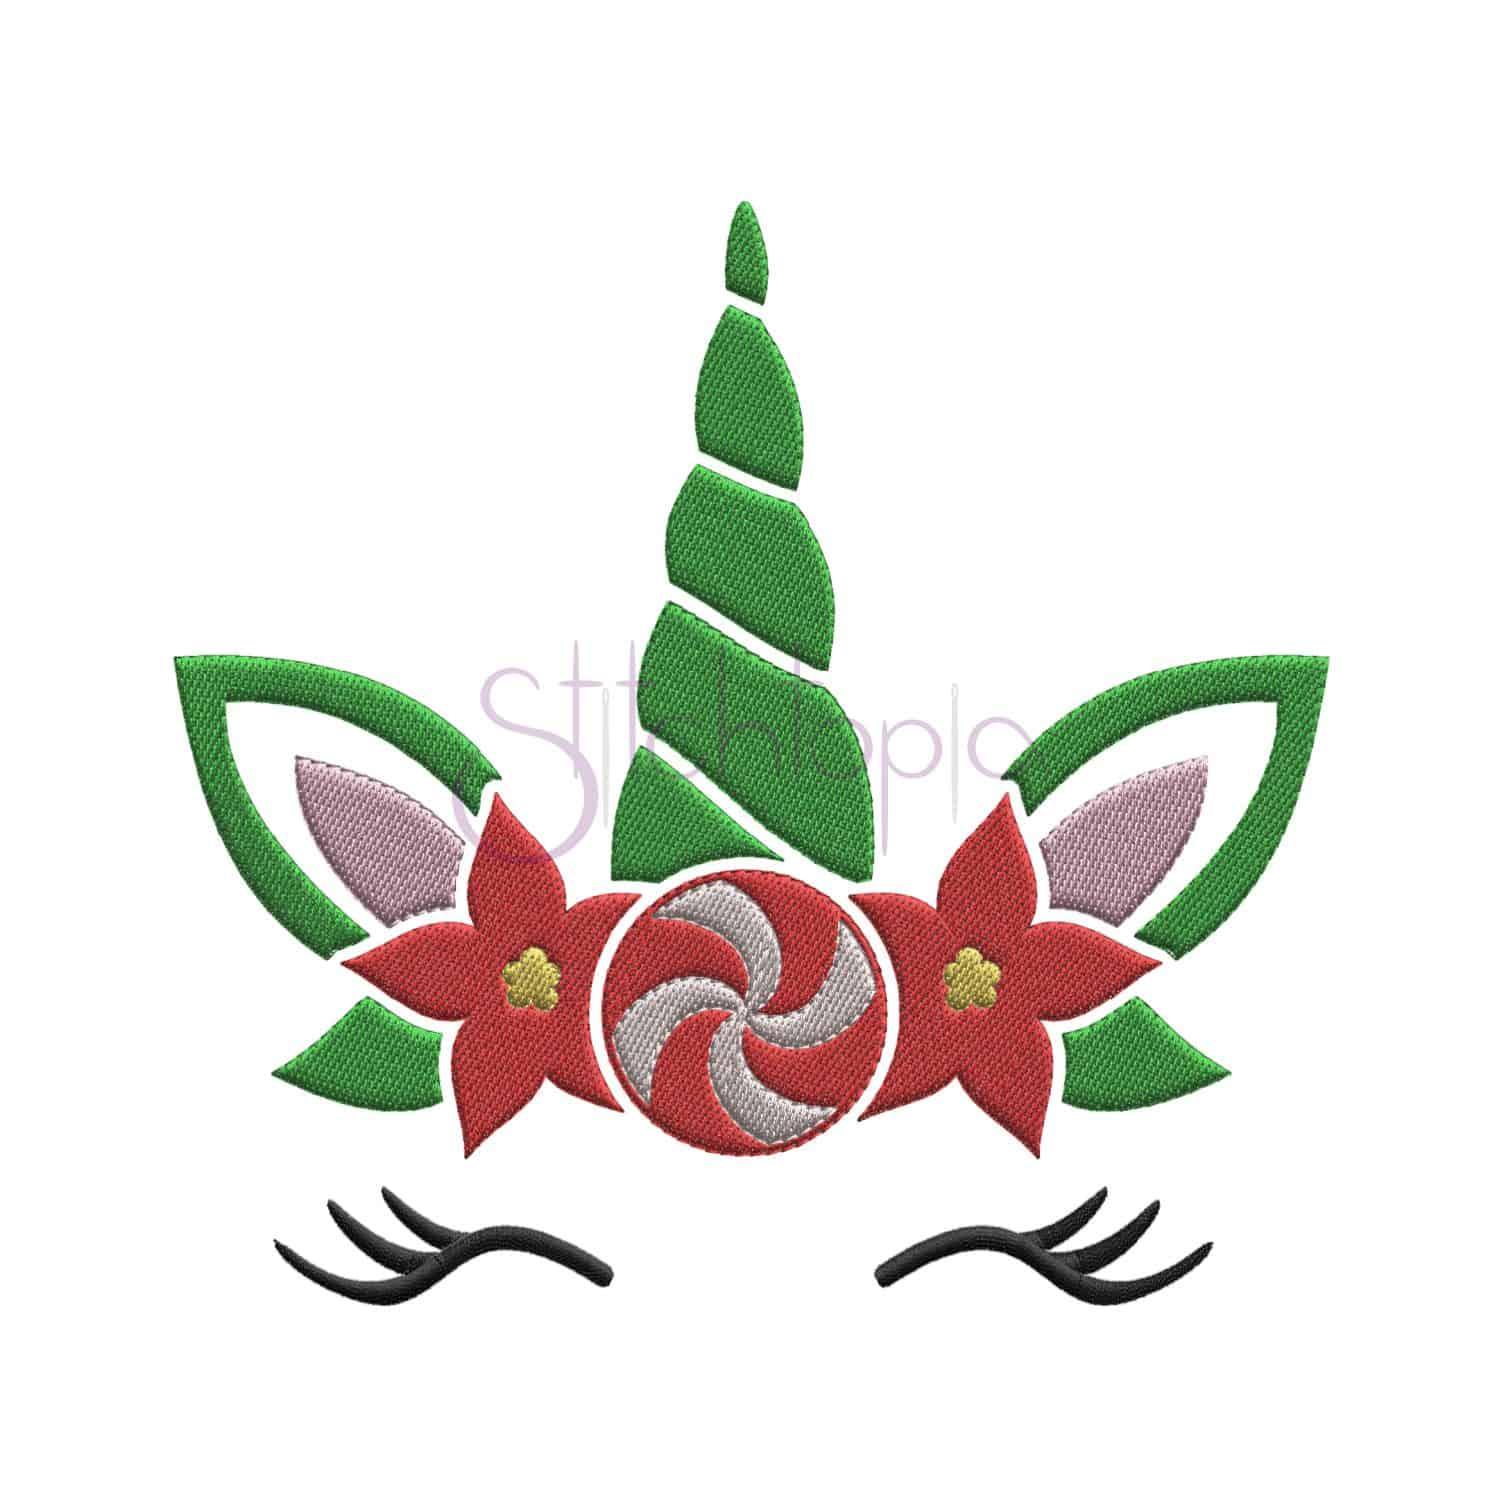 Christmas Unicorn.Christmas Unicorn Embroidery Design